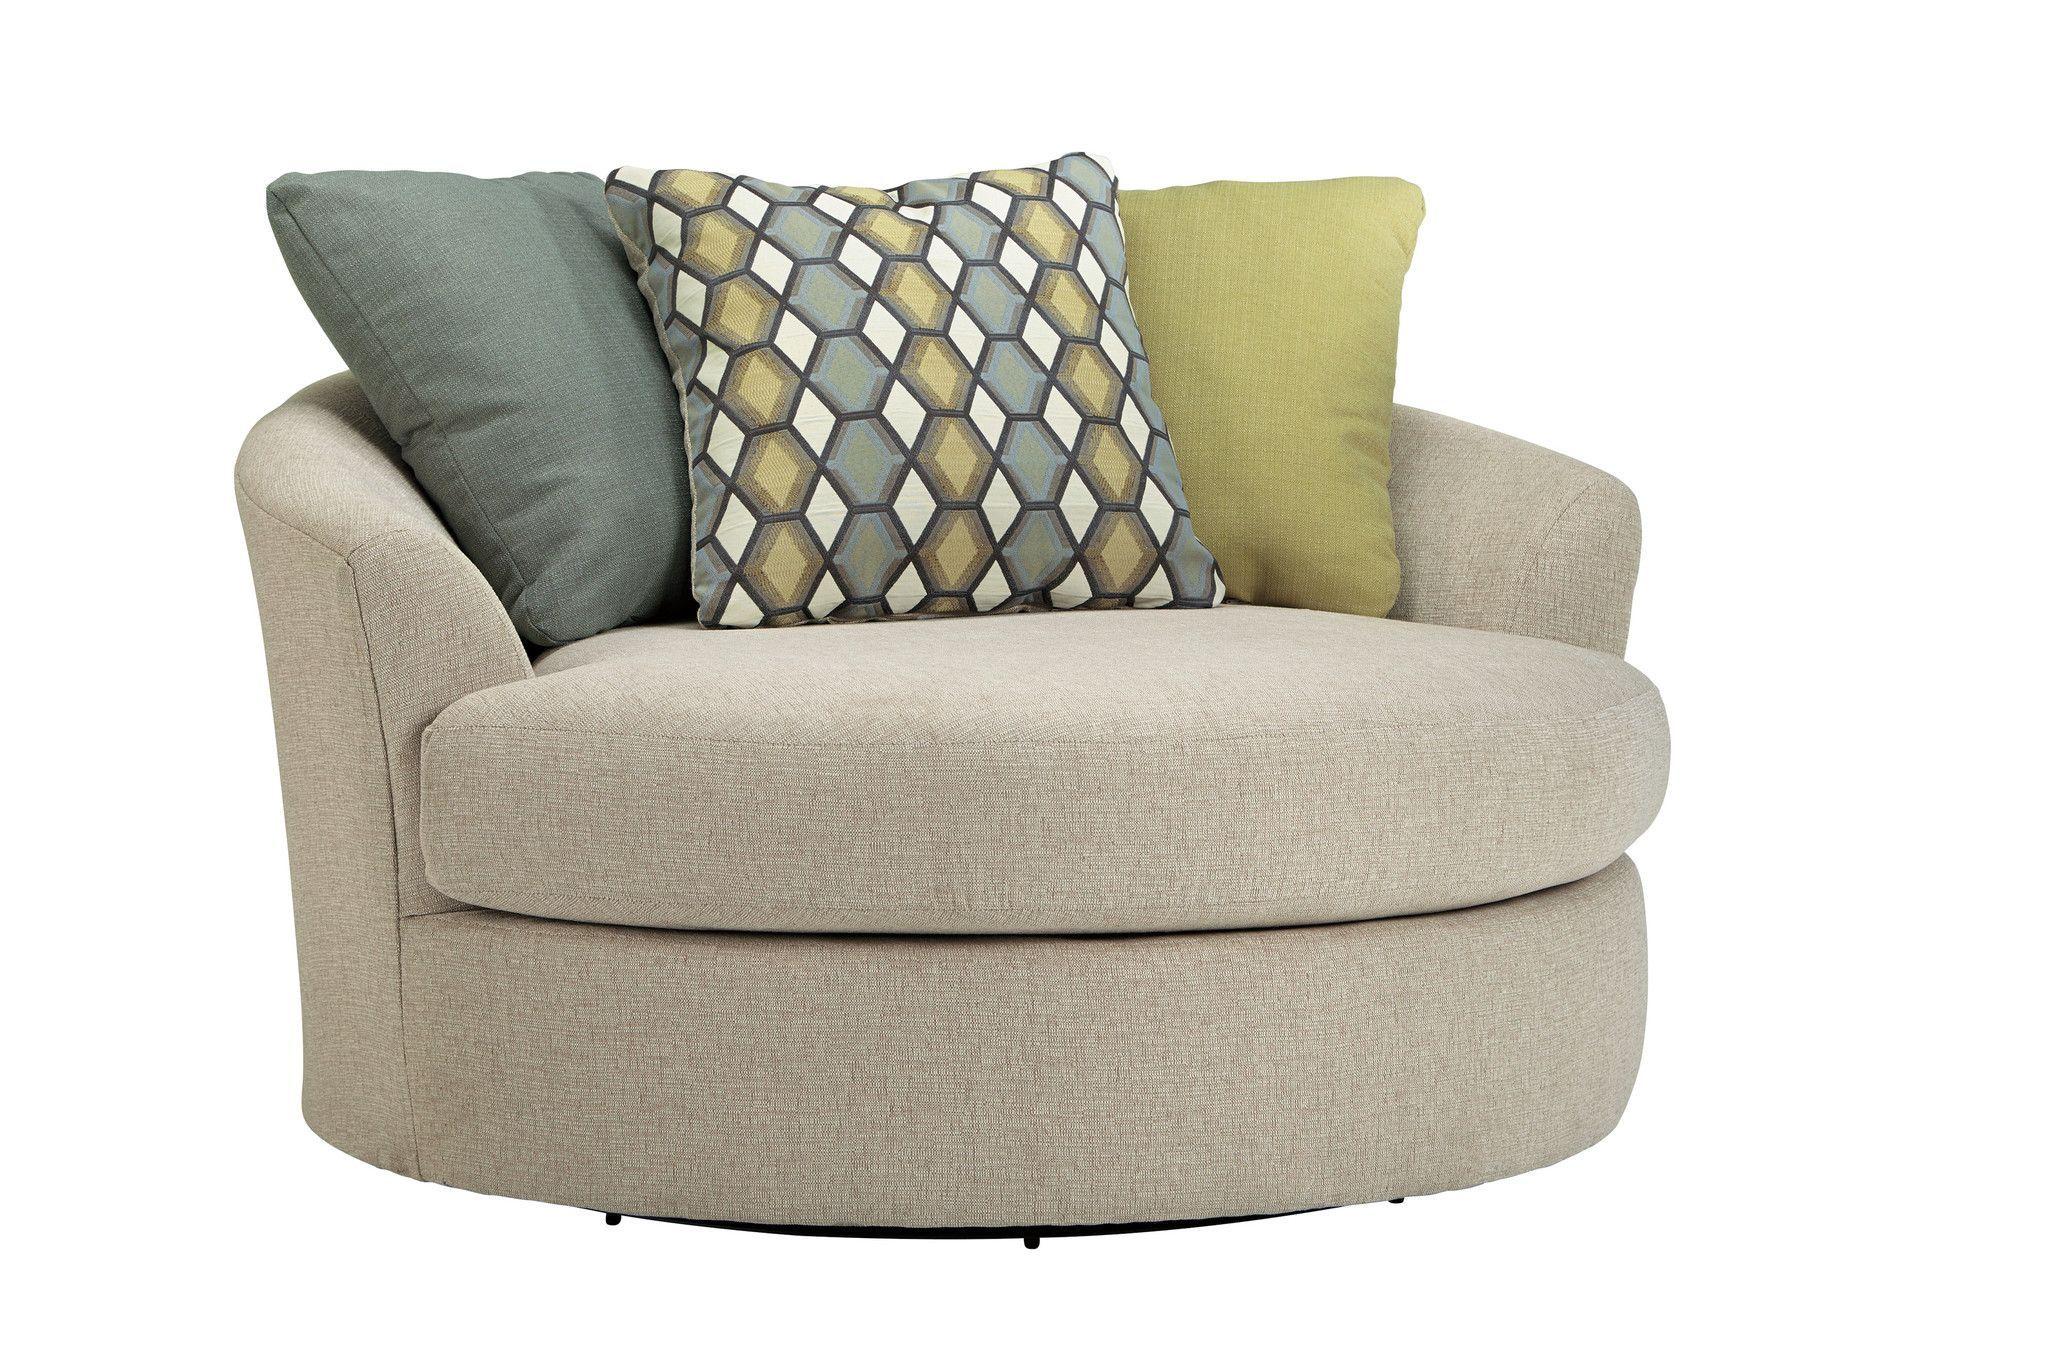 Swivel Chair Nebraska Furniture Mart Nailhead Dining Chairs Casheral Oversized Snuggle